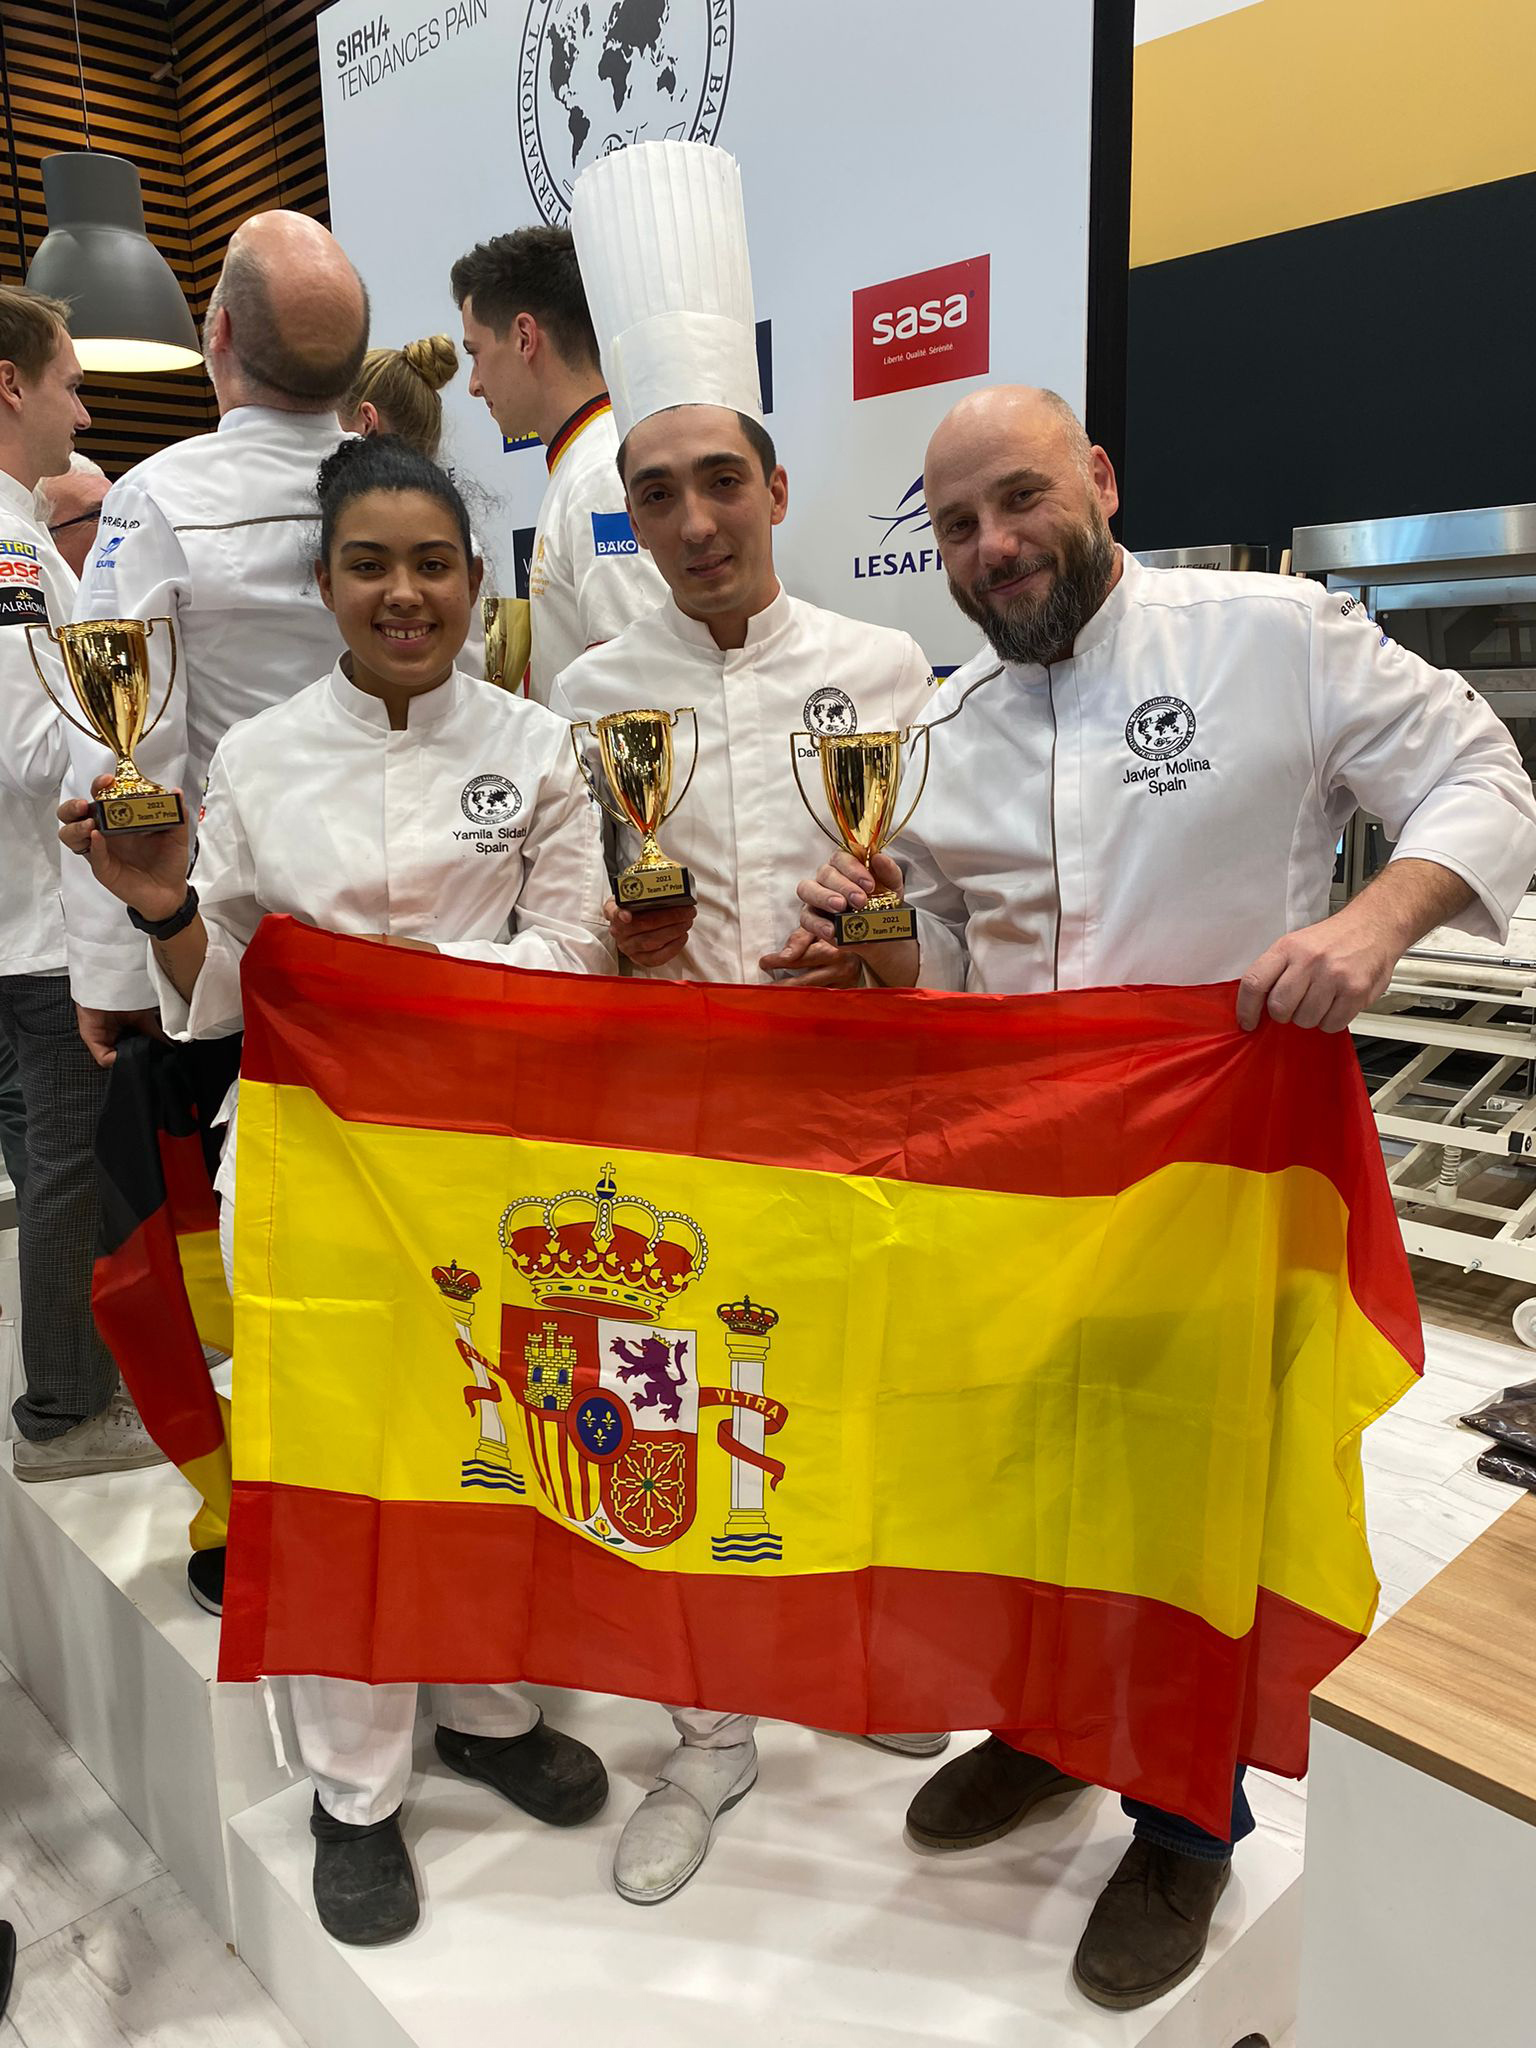 campeonato-internacional-de-la-uibc-espana-tercera